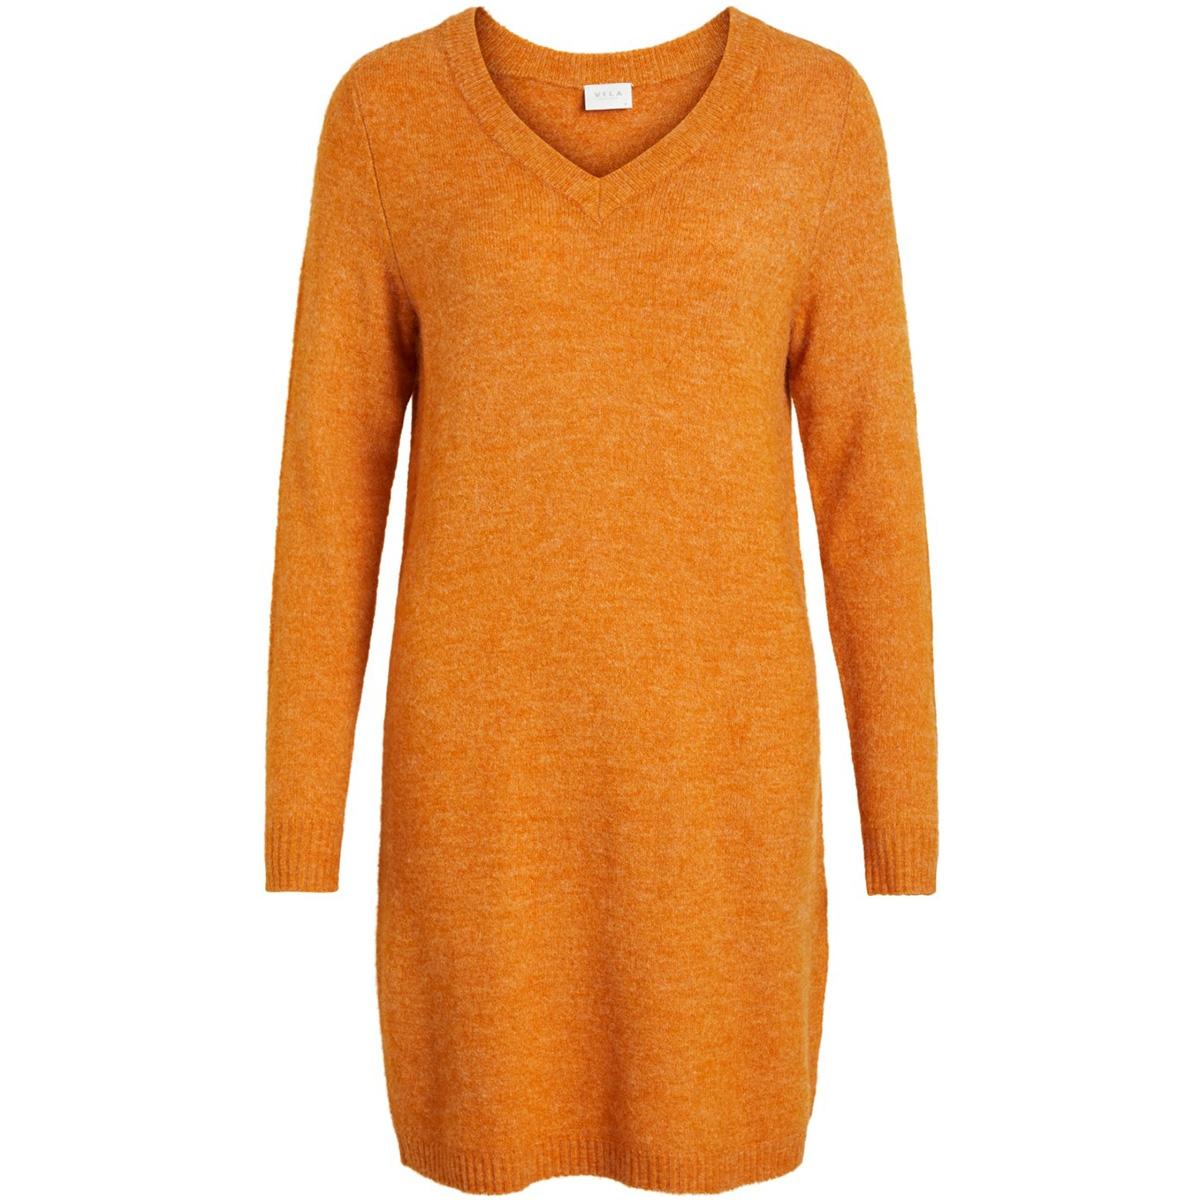 vivikka l/s knit v-neck dress - noos 14052907 vila jurk golden oak/melange